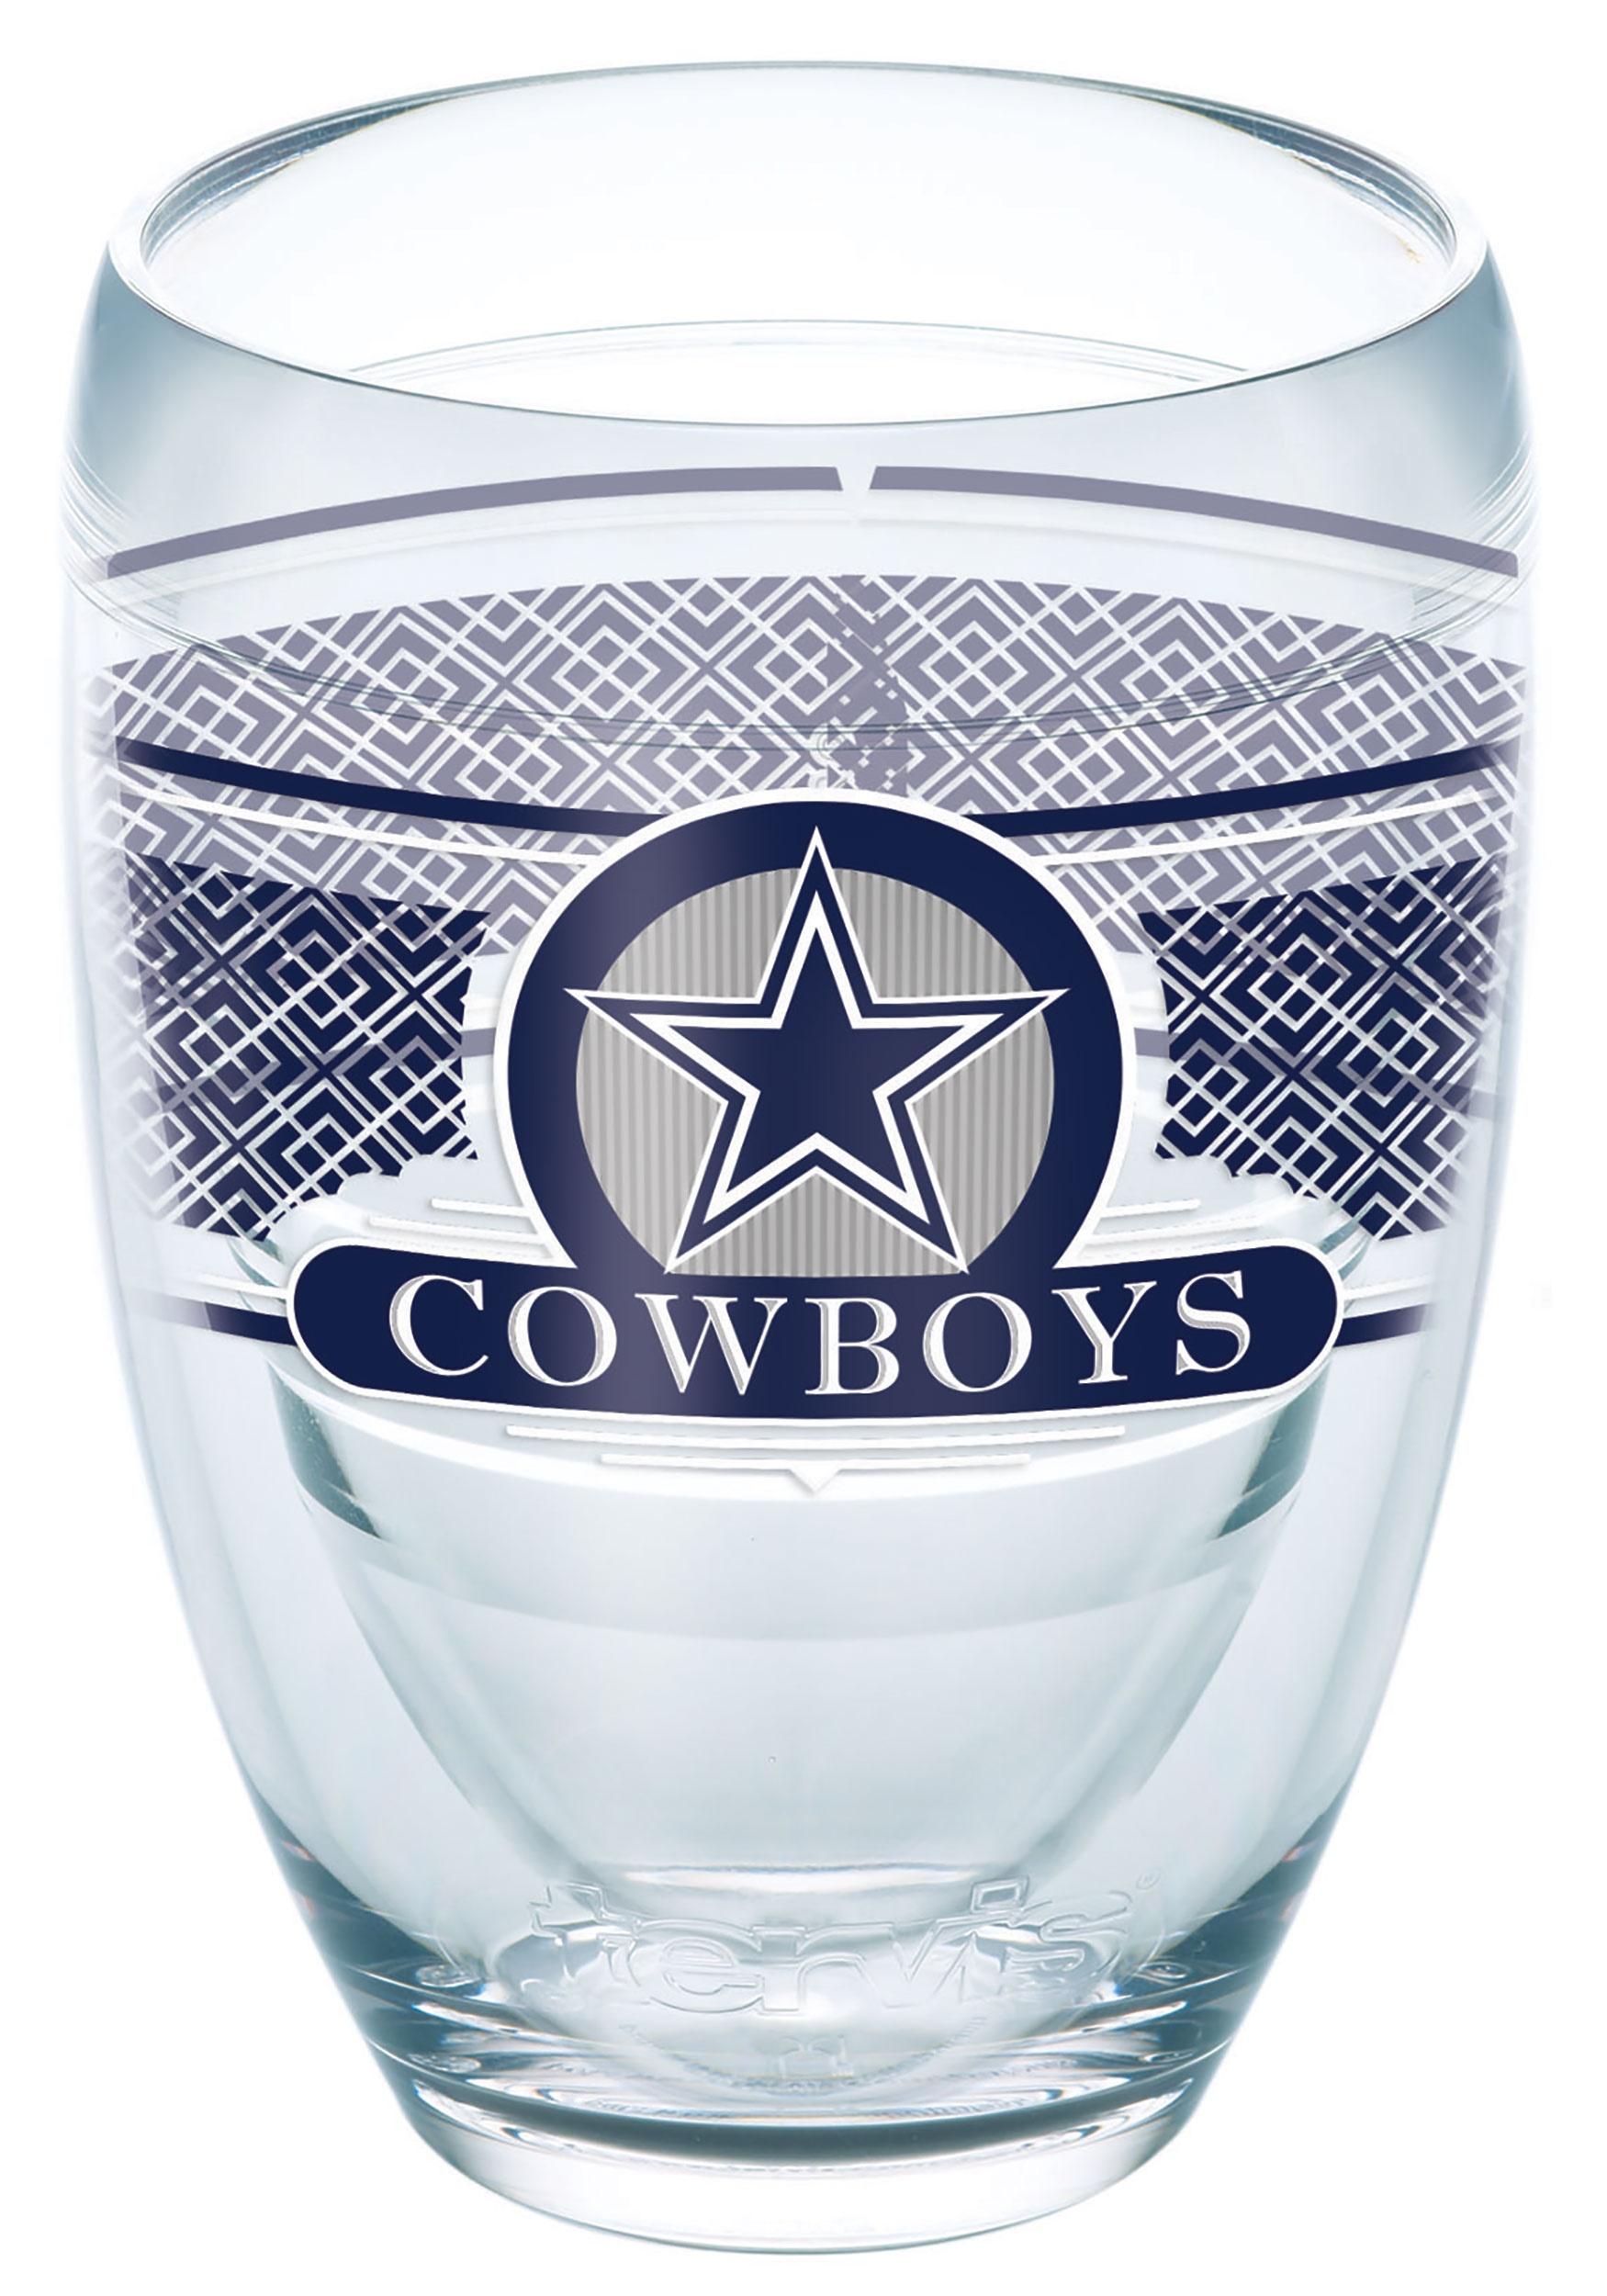 Tervis NFL Dallas Cowboys 9 oz Stemless Wine Glass 45fbc1e96ba